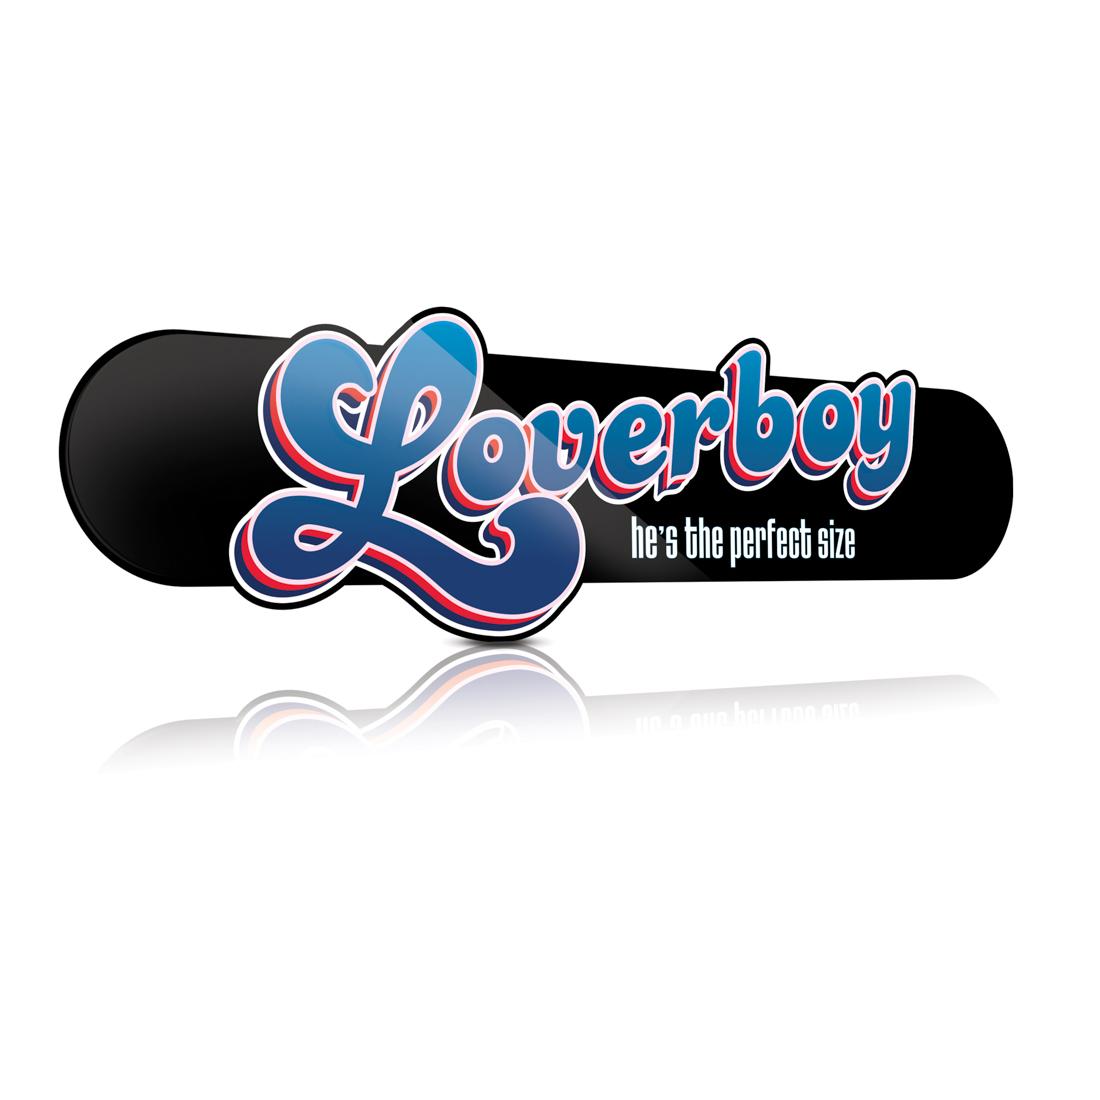 Loverboy - Slatwall Sign